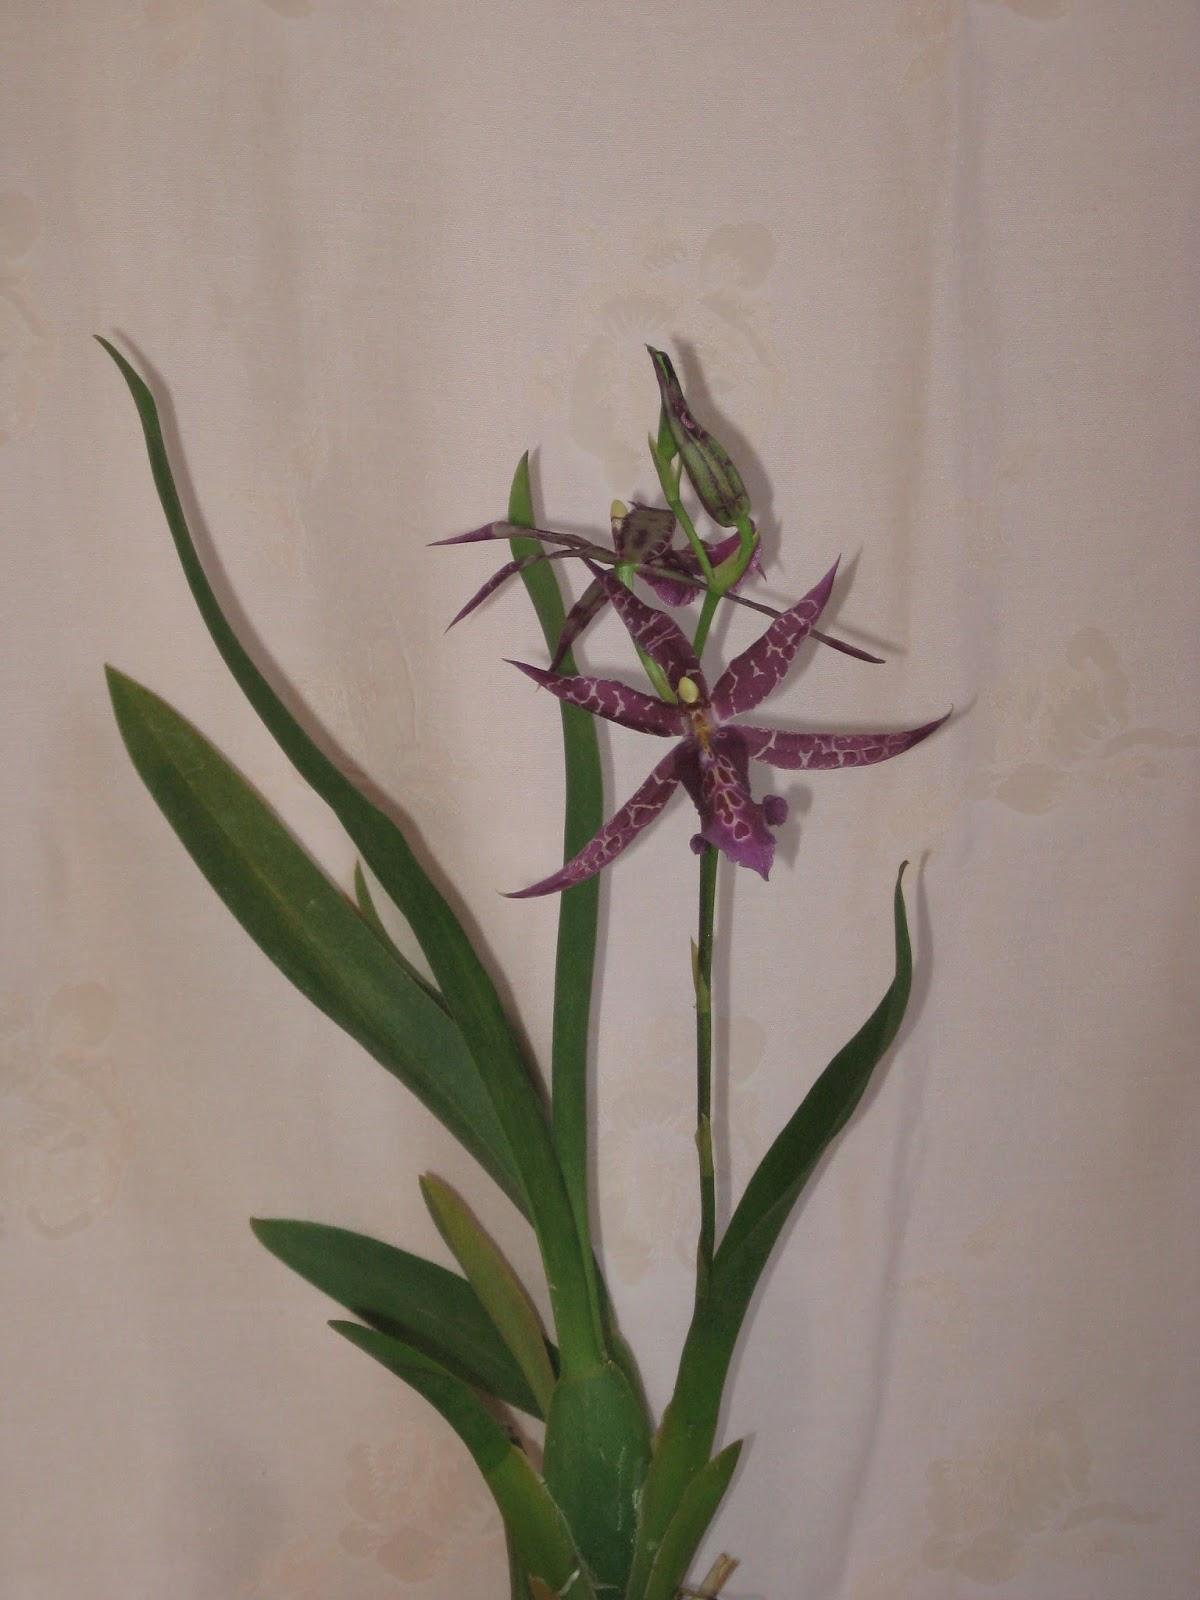 Miltassia Sadie Loo x Miltonidium Christmas Eve. Цветонос орхидеи